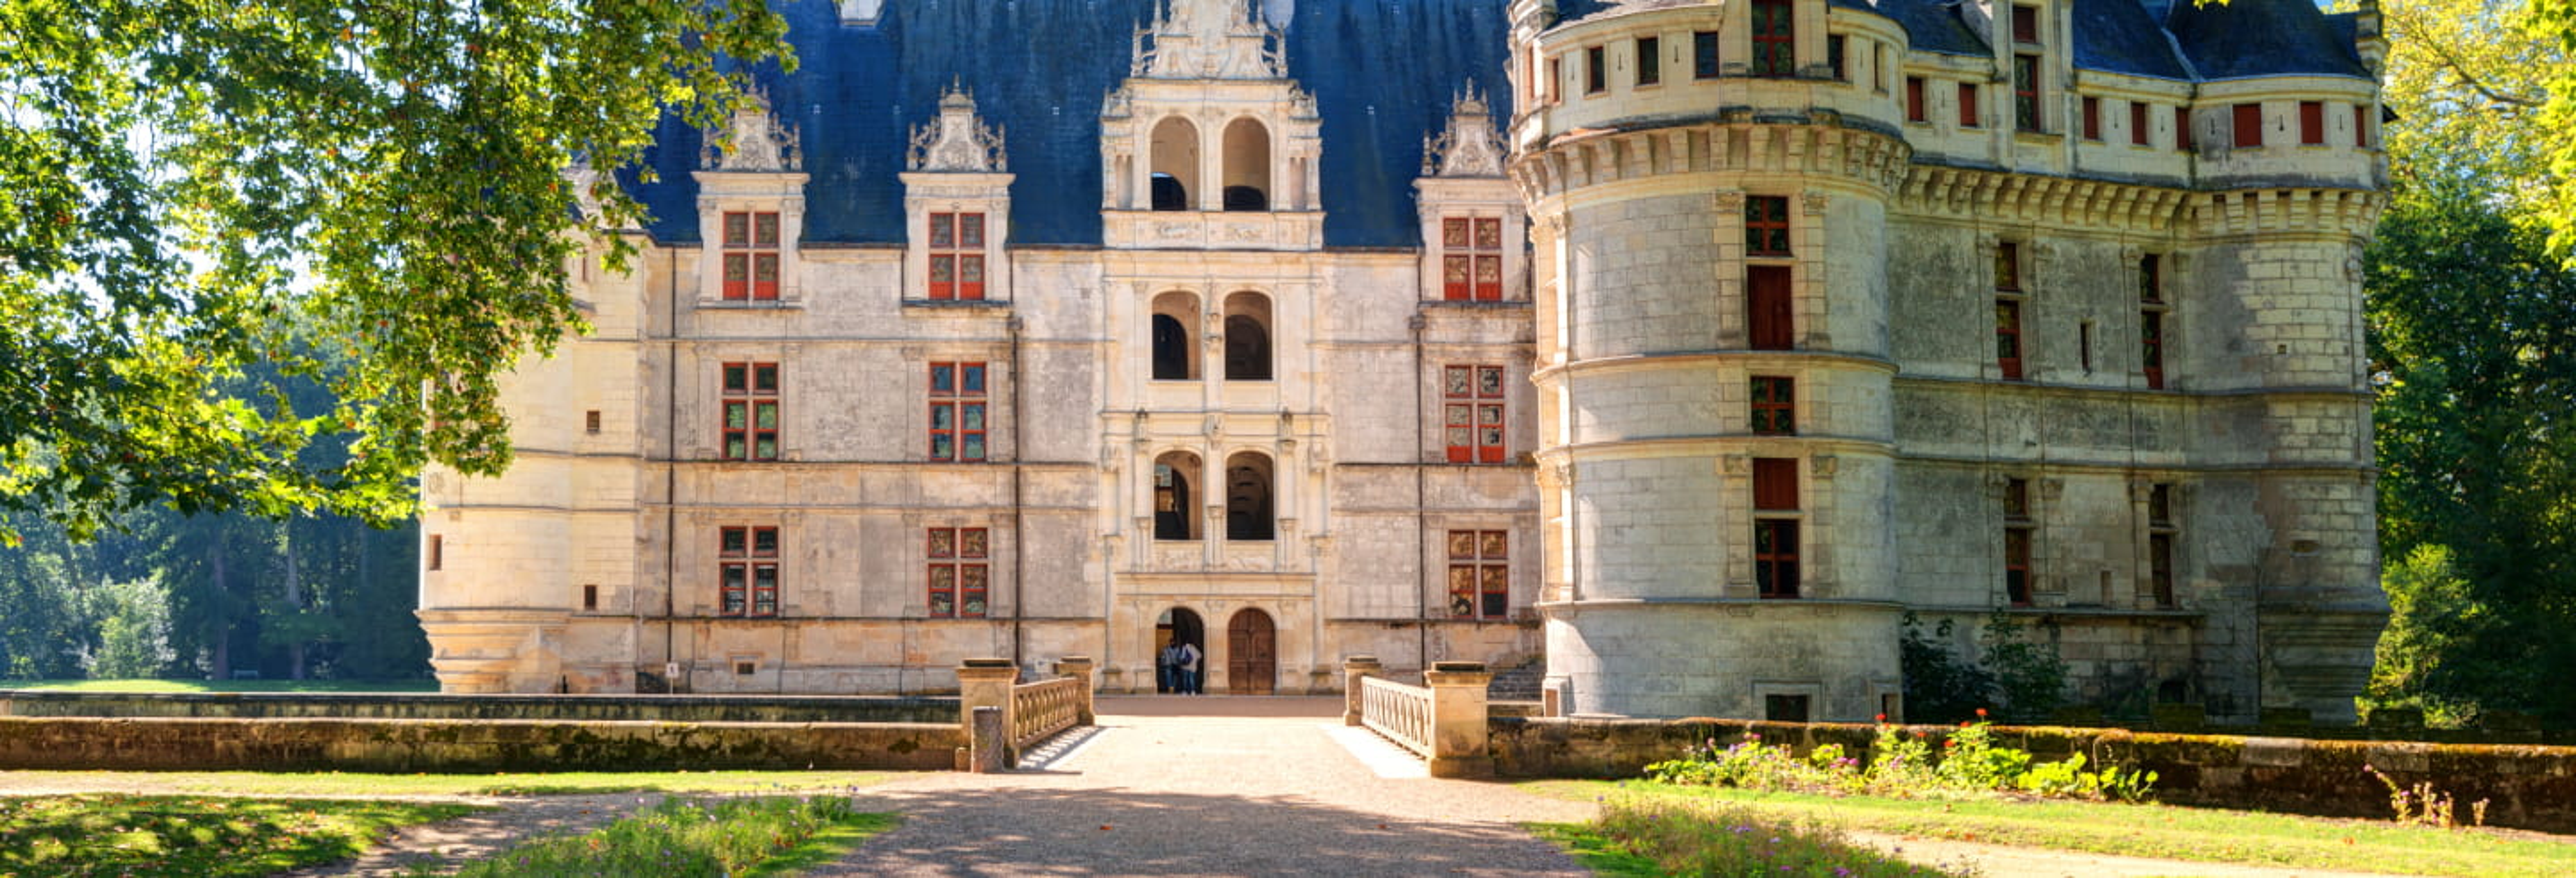 Entrada al castillo de Azay-le-Rideau